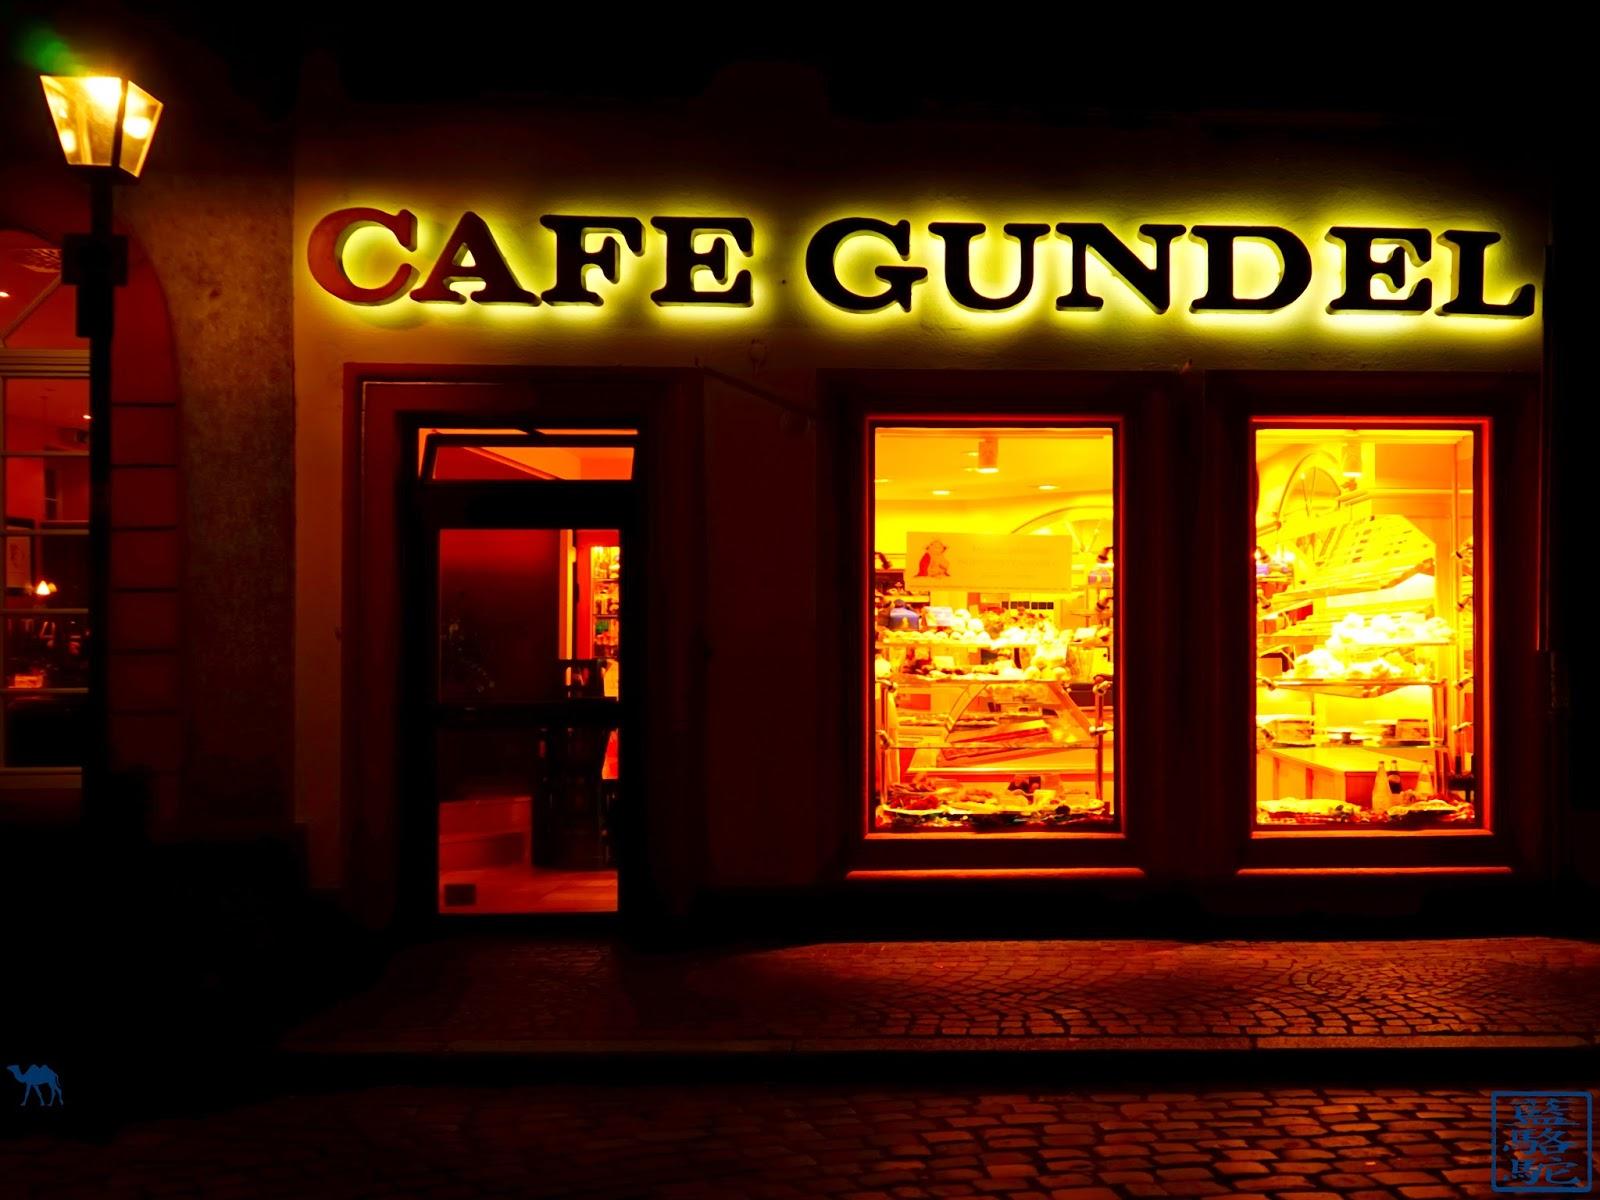 Le Chameau Bleu - Café Gundel - Heidelberg